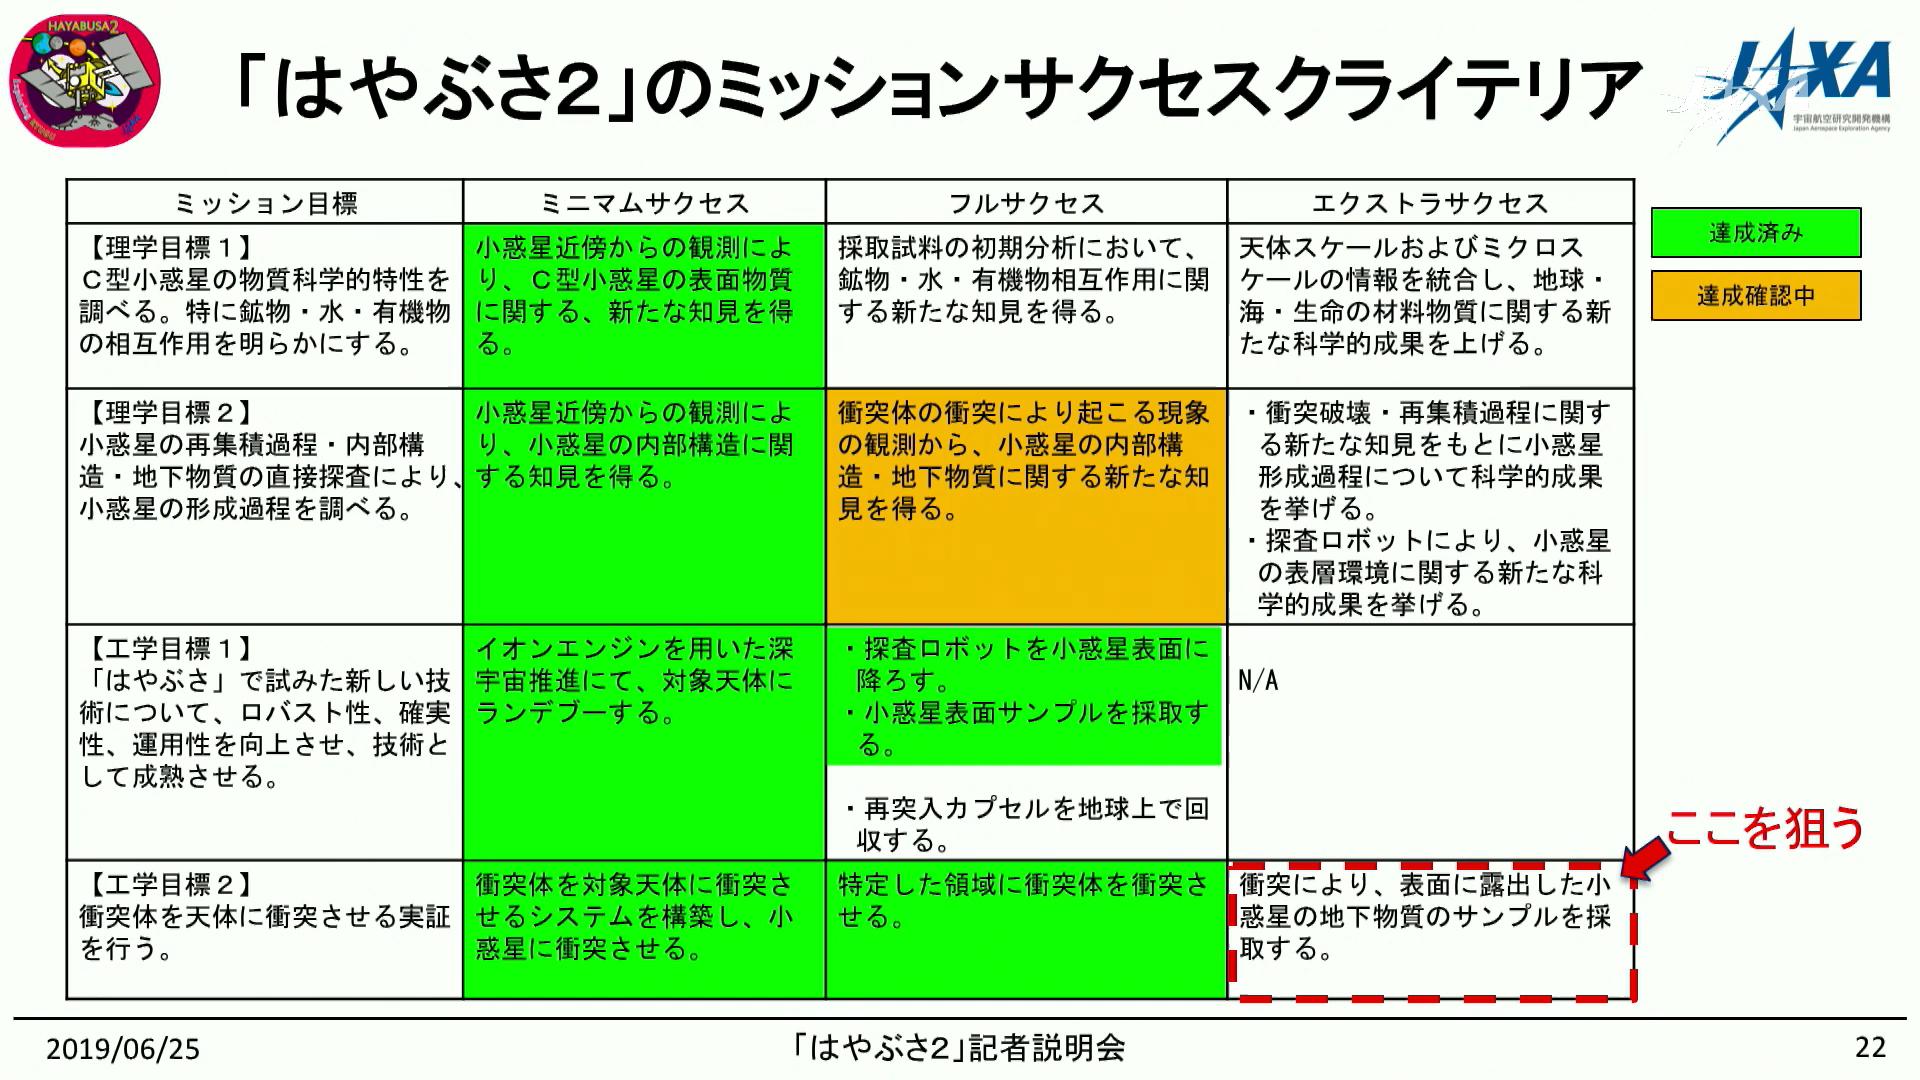 f:id:Imamura:20190625234854p:plain